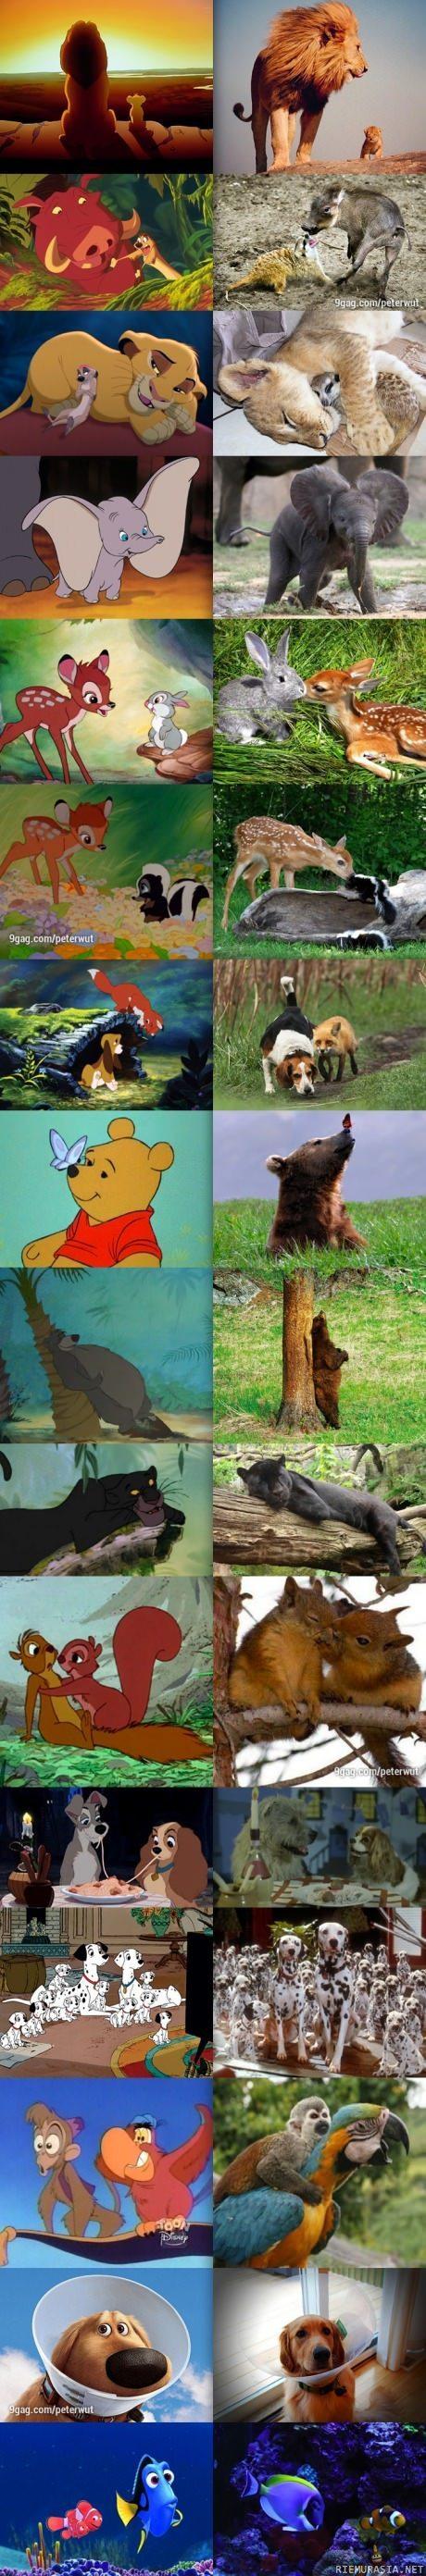 Disneyn eläimet irl